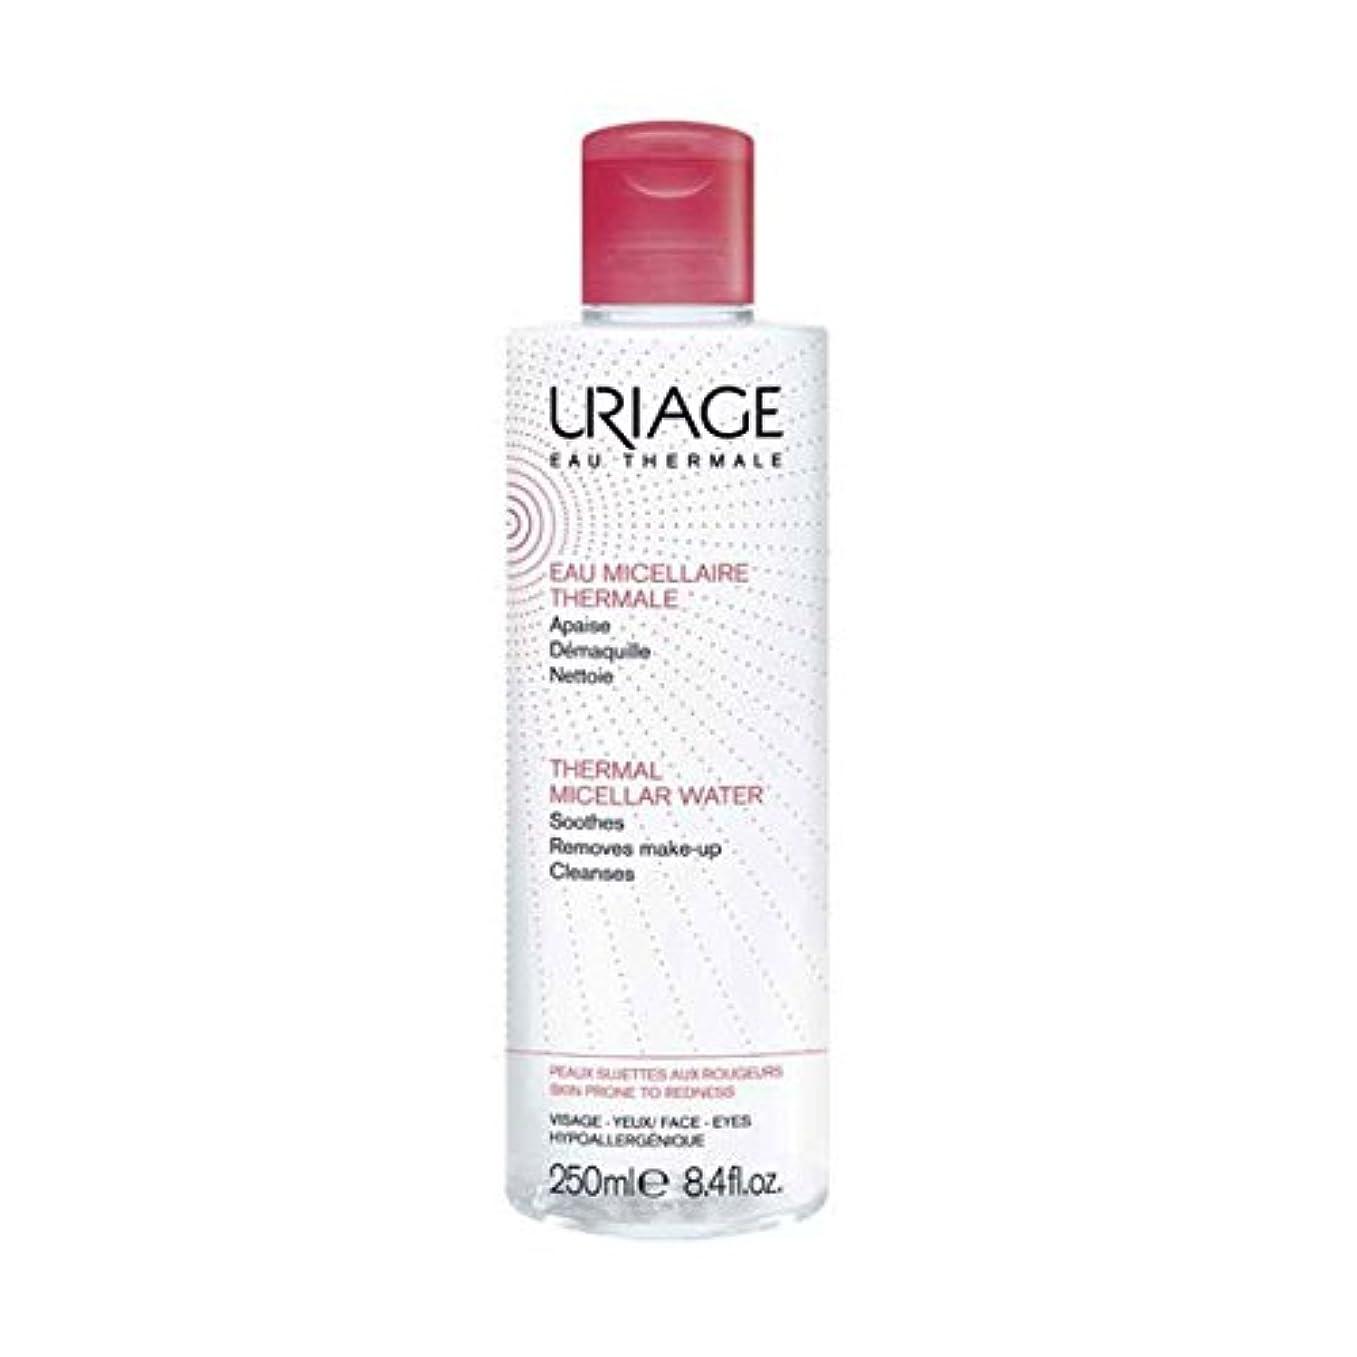 候補者補助局Uriage Thermal Micellar Water Skin Prone To Redness 250ml [並行輸入品]